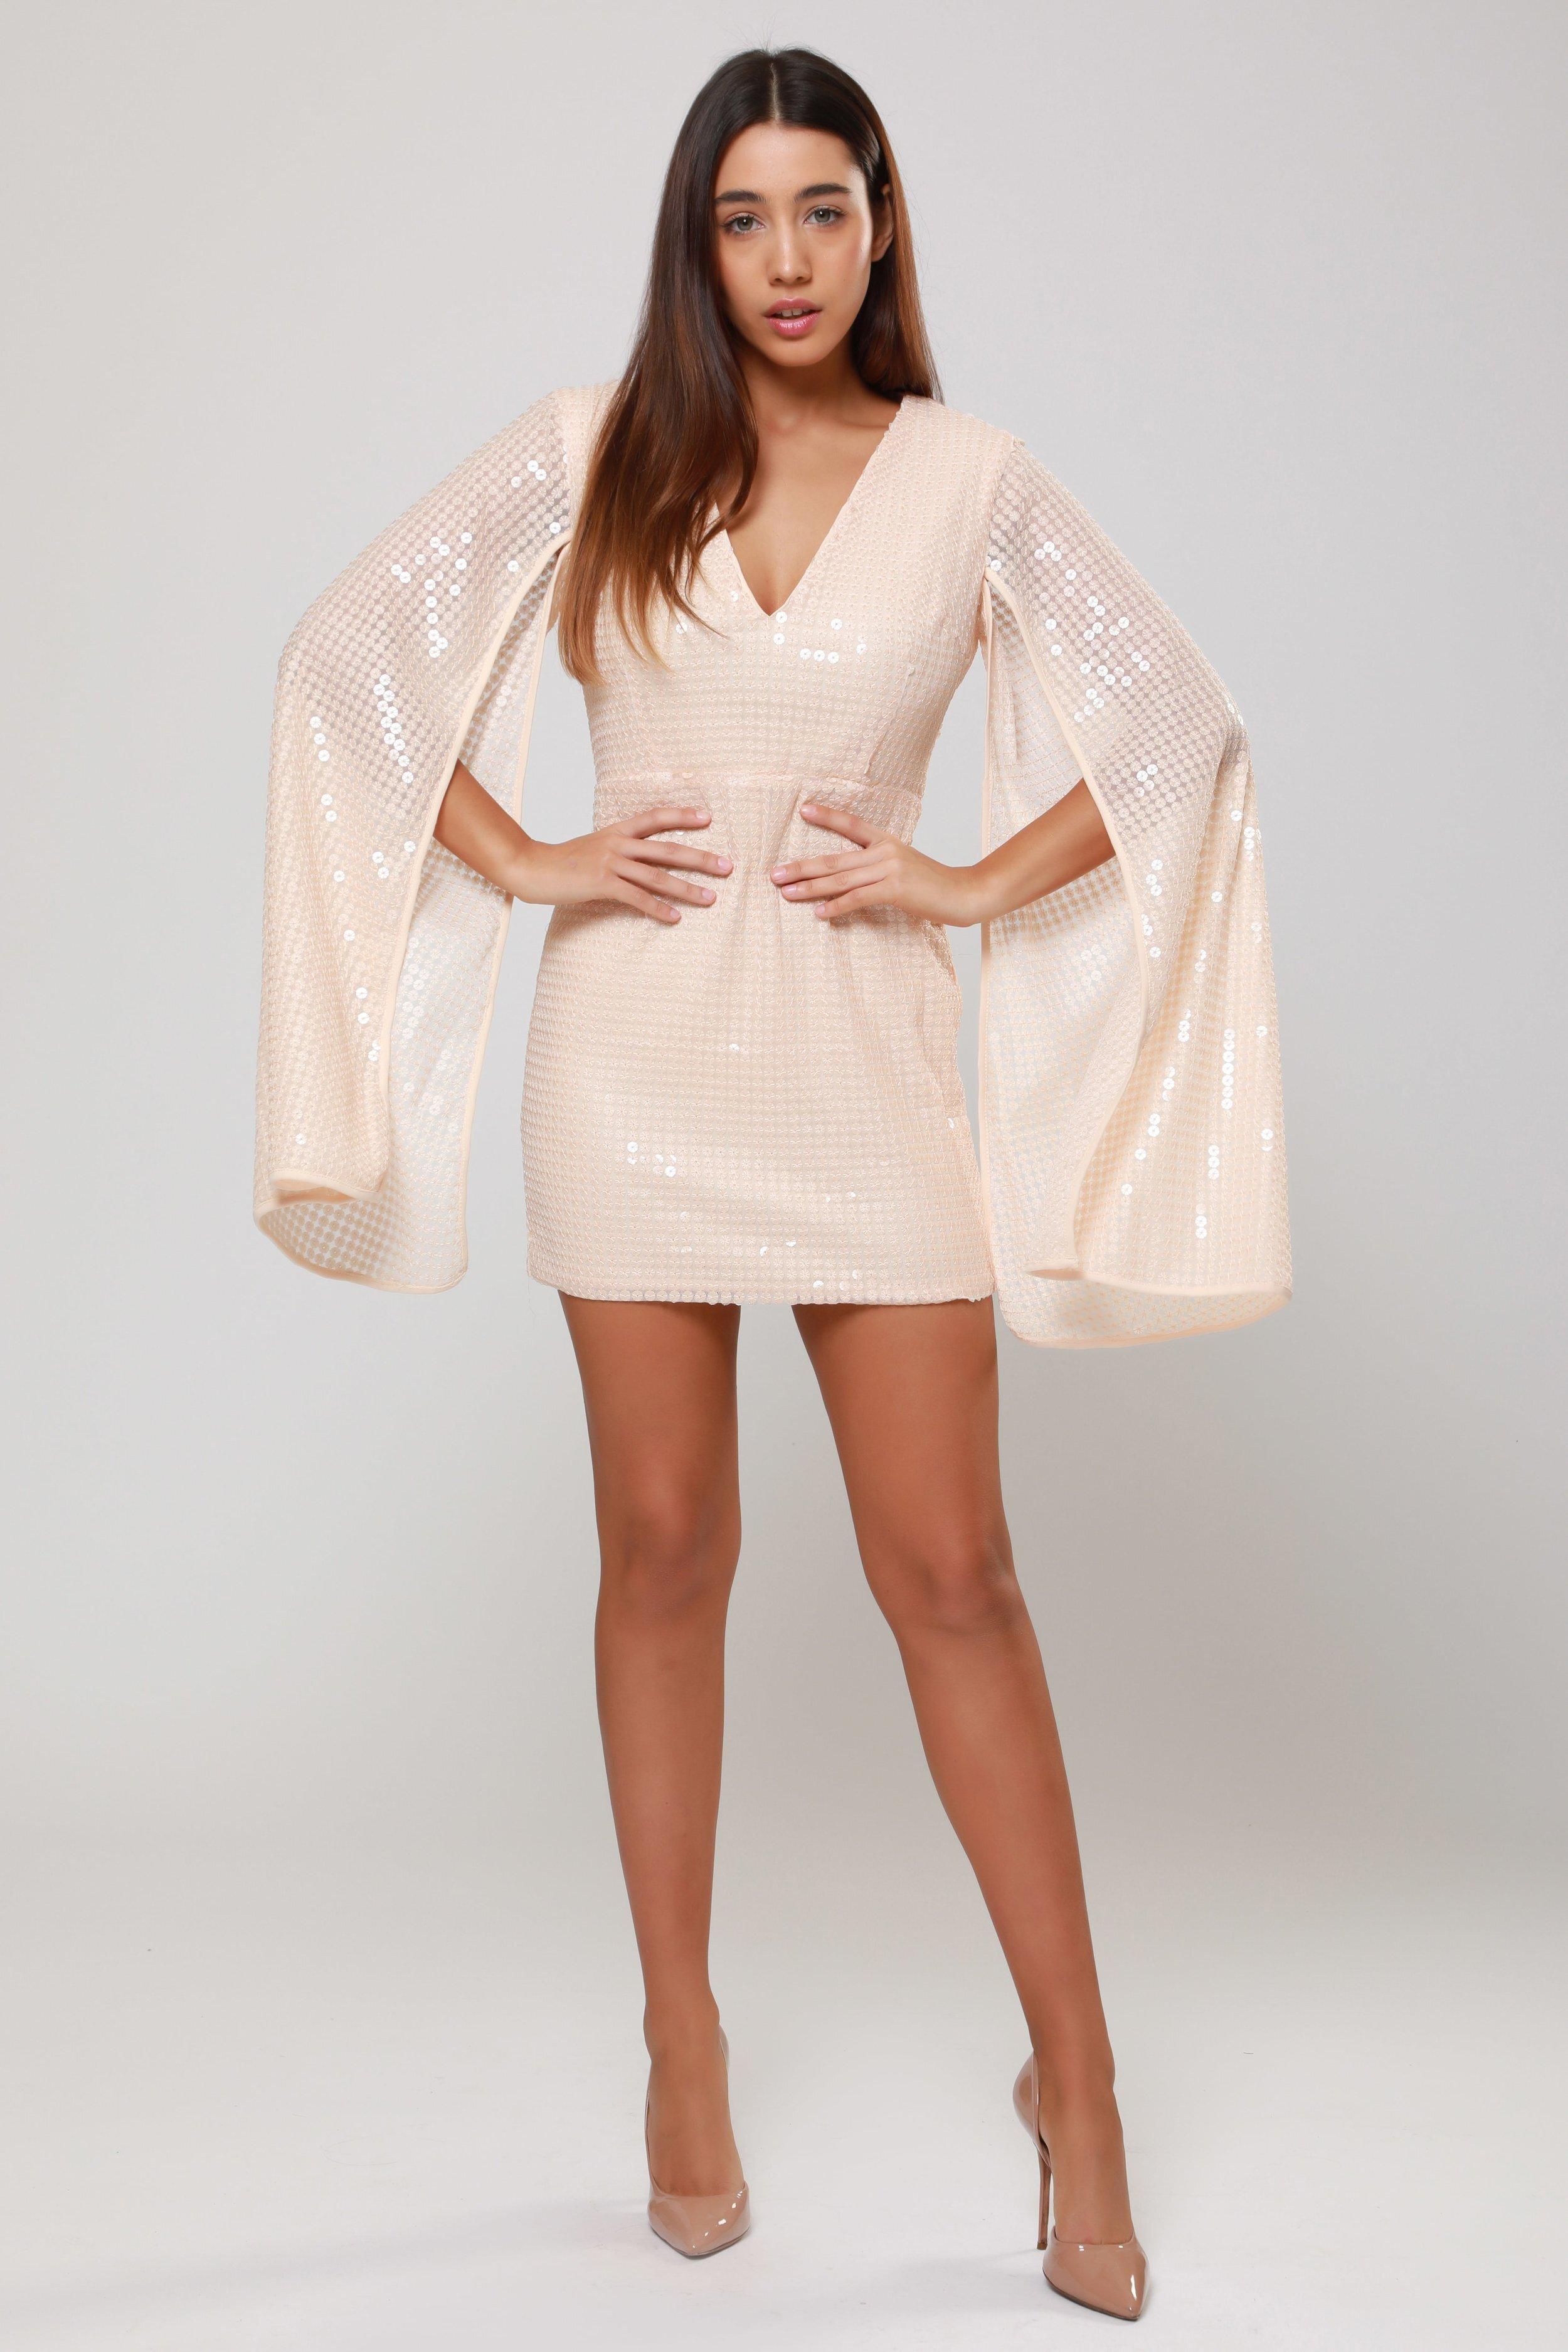 Liquid Sequin  Mini Dress   £68.00